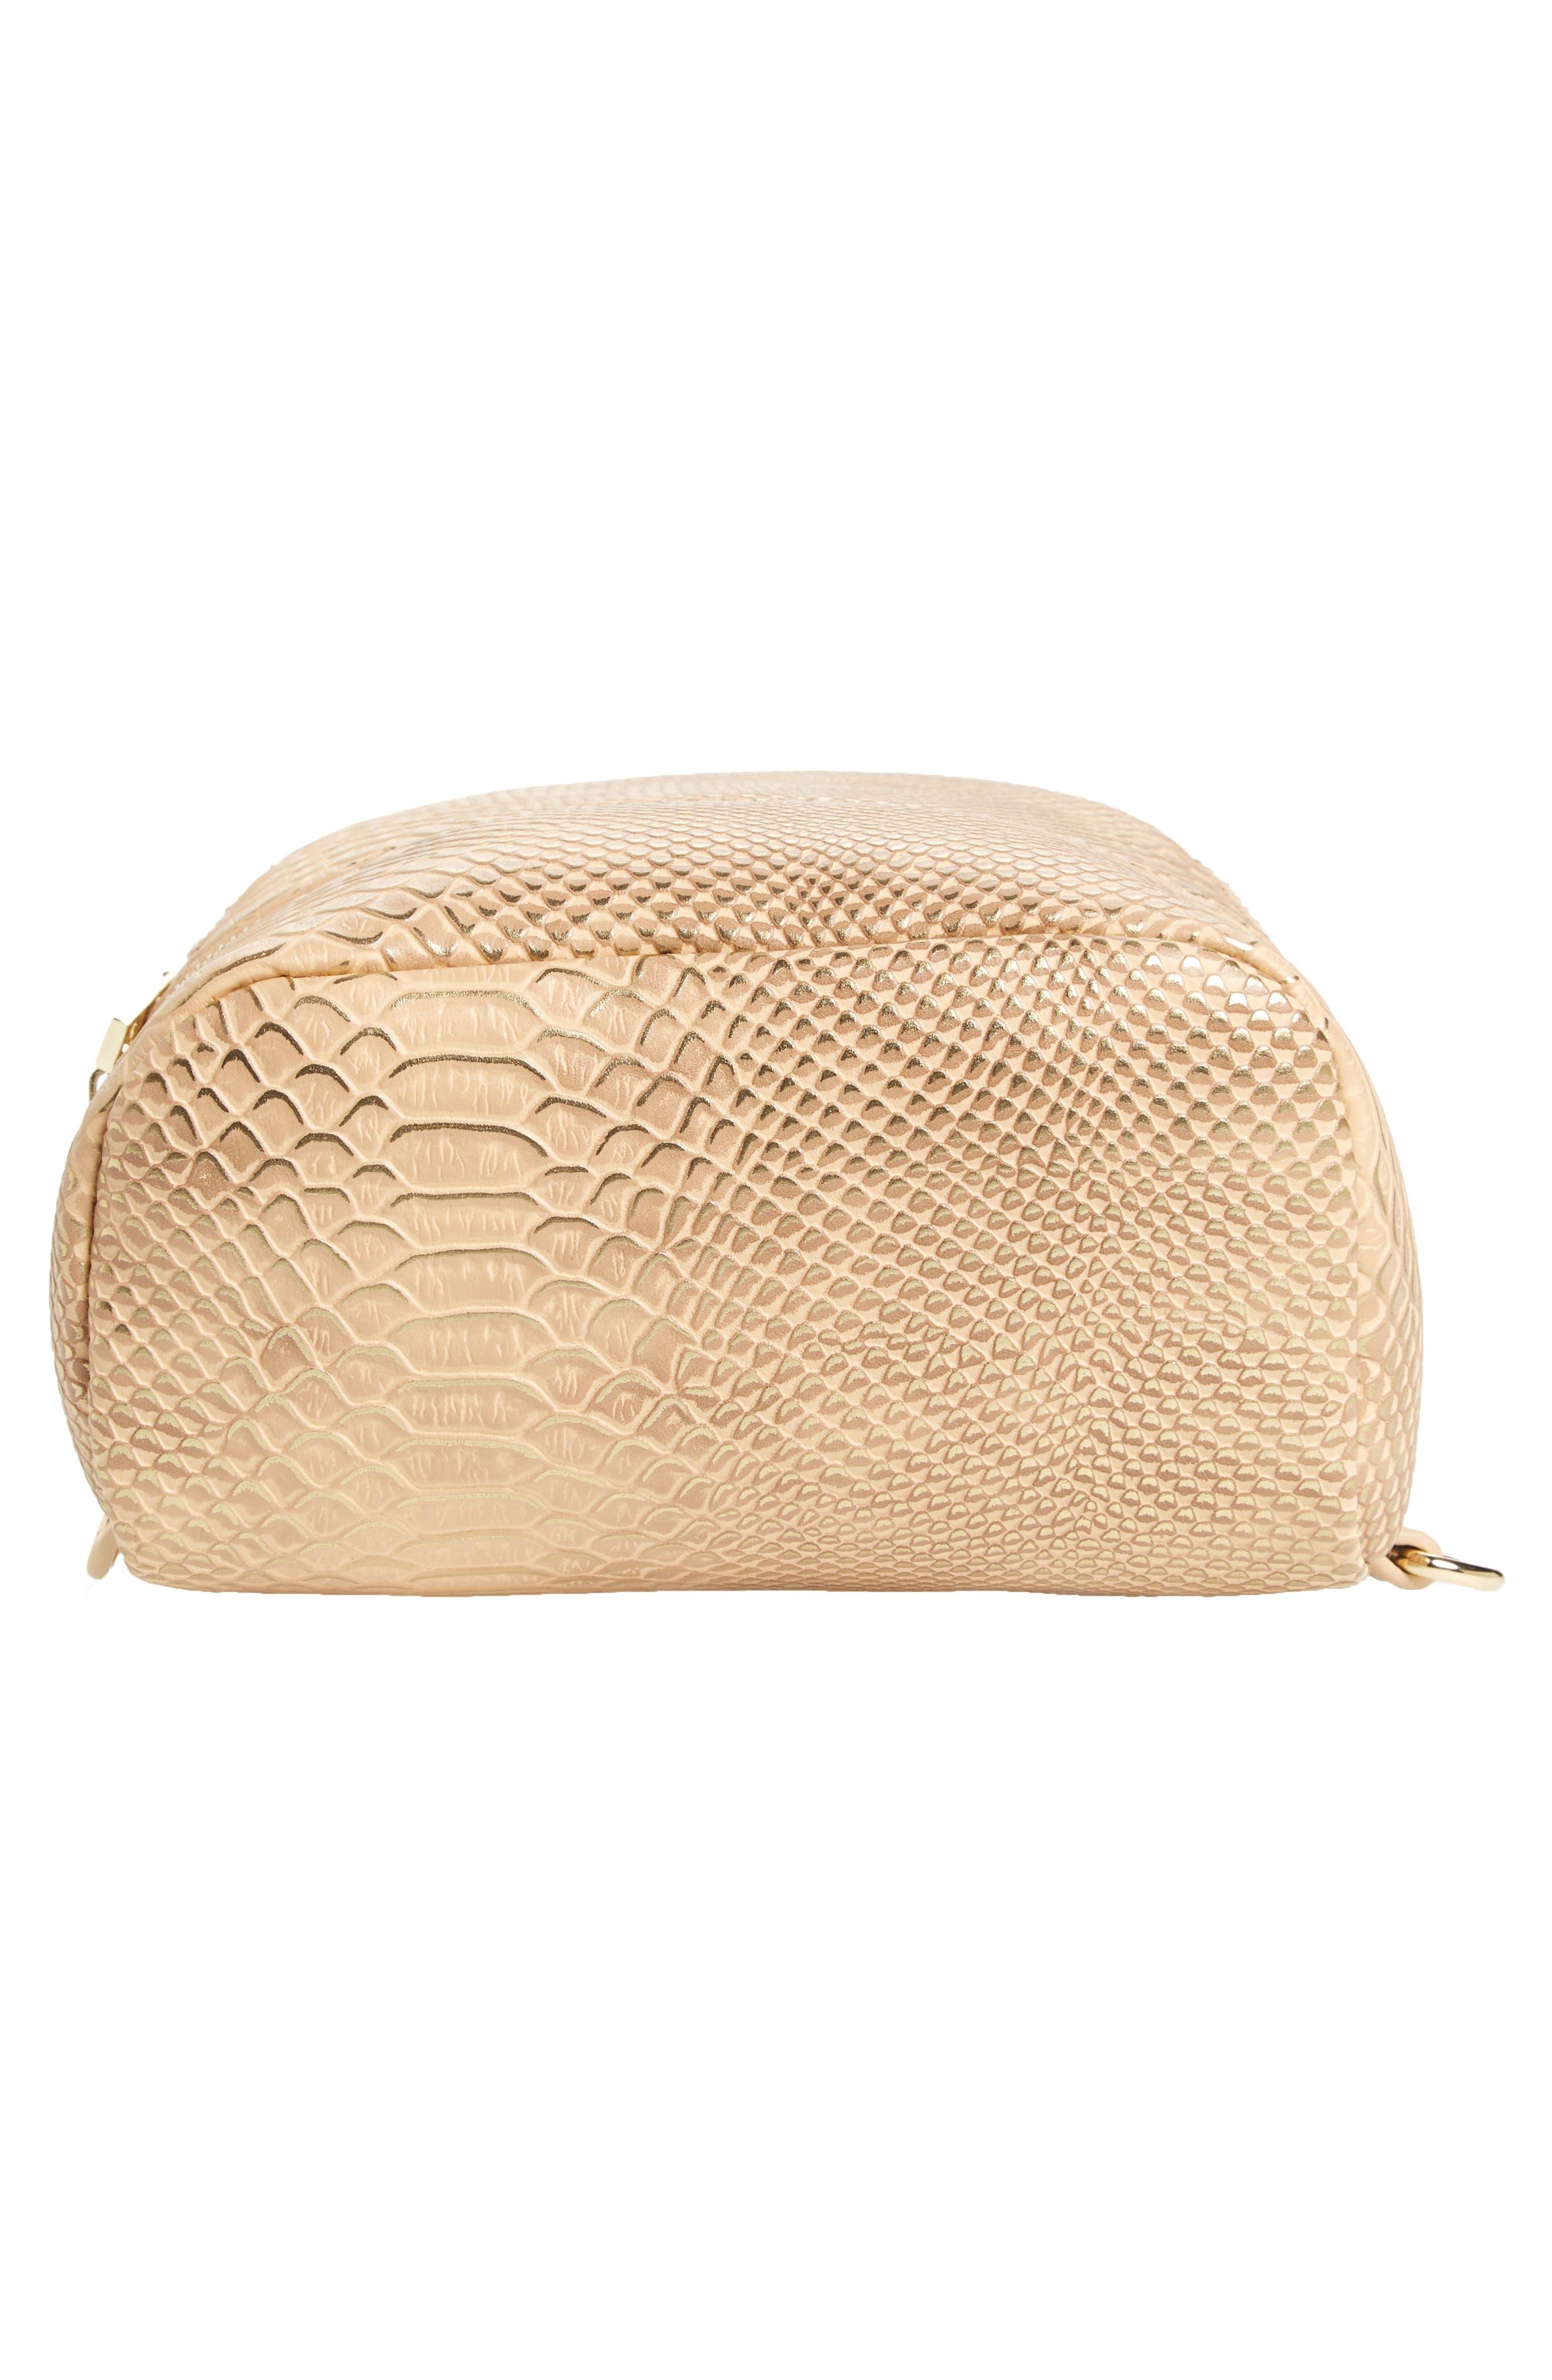 Colette Faux Leather Backpack,                             Alternate thumbnail 6, color,                             250